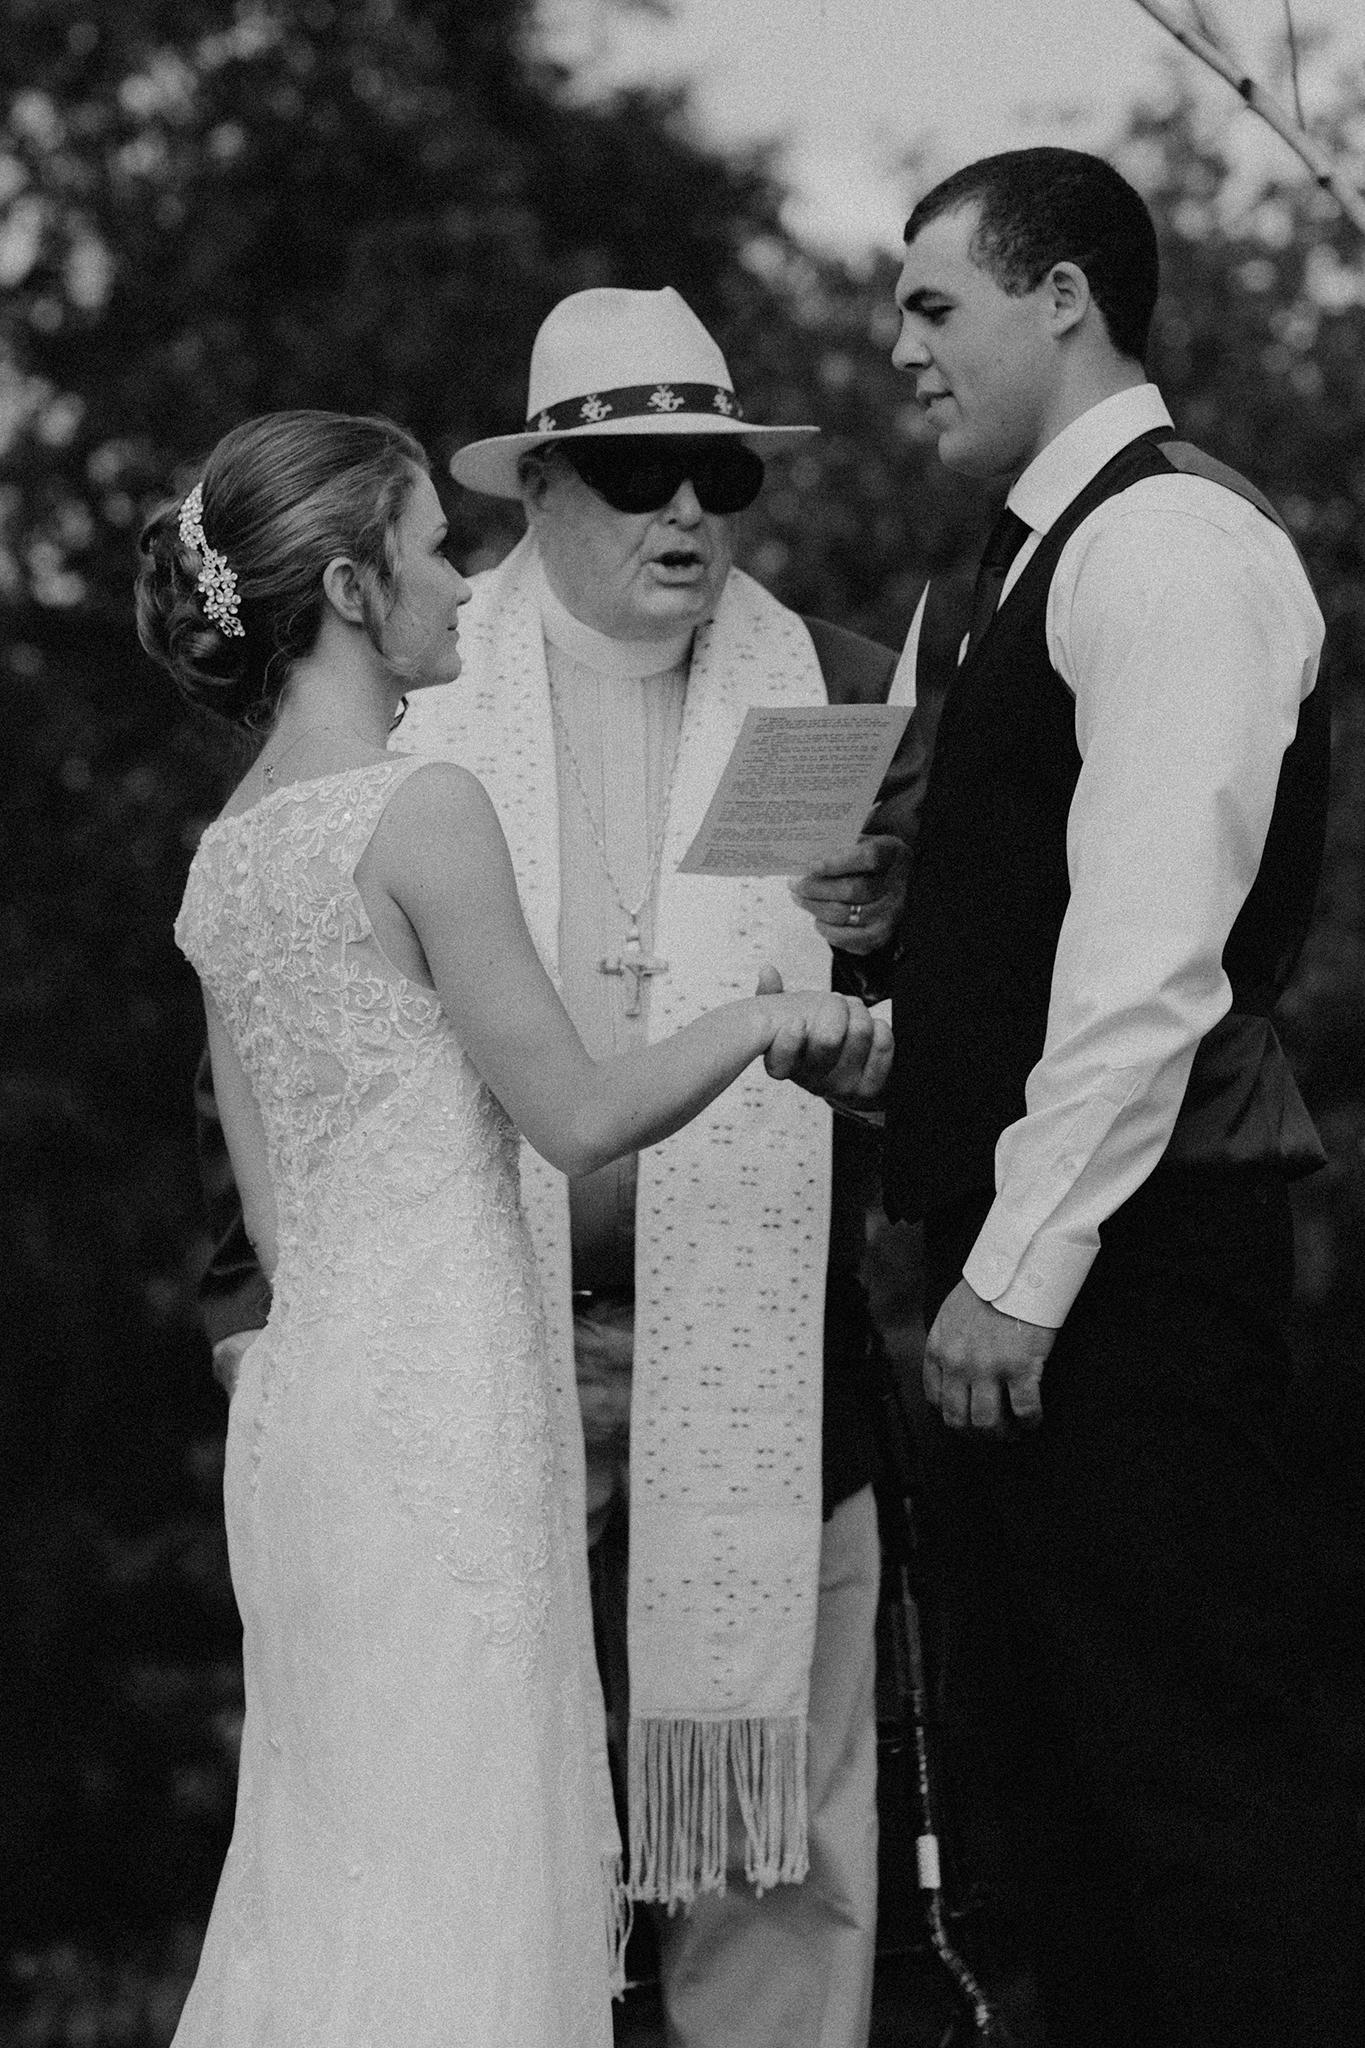 vermont-wedding-photographer-outdoor-farm-wedding-12.jpg